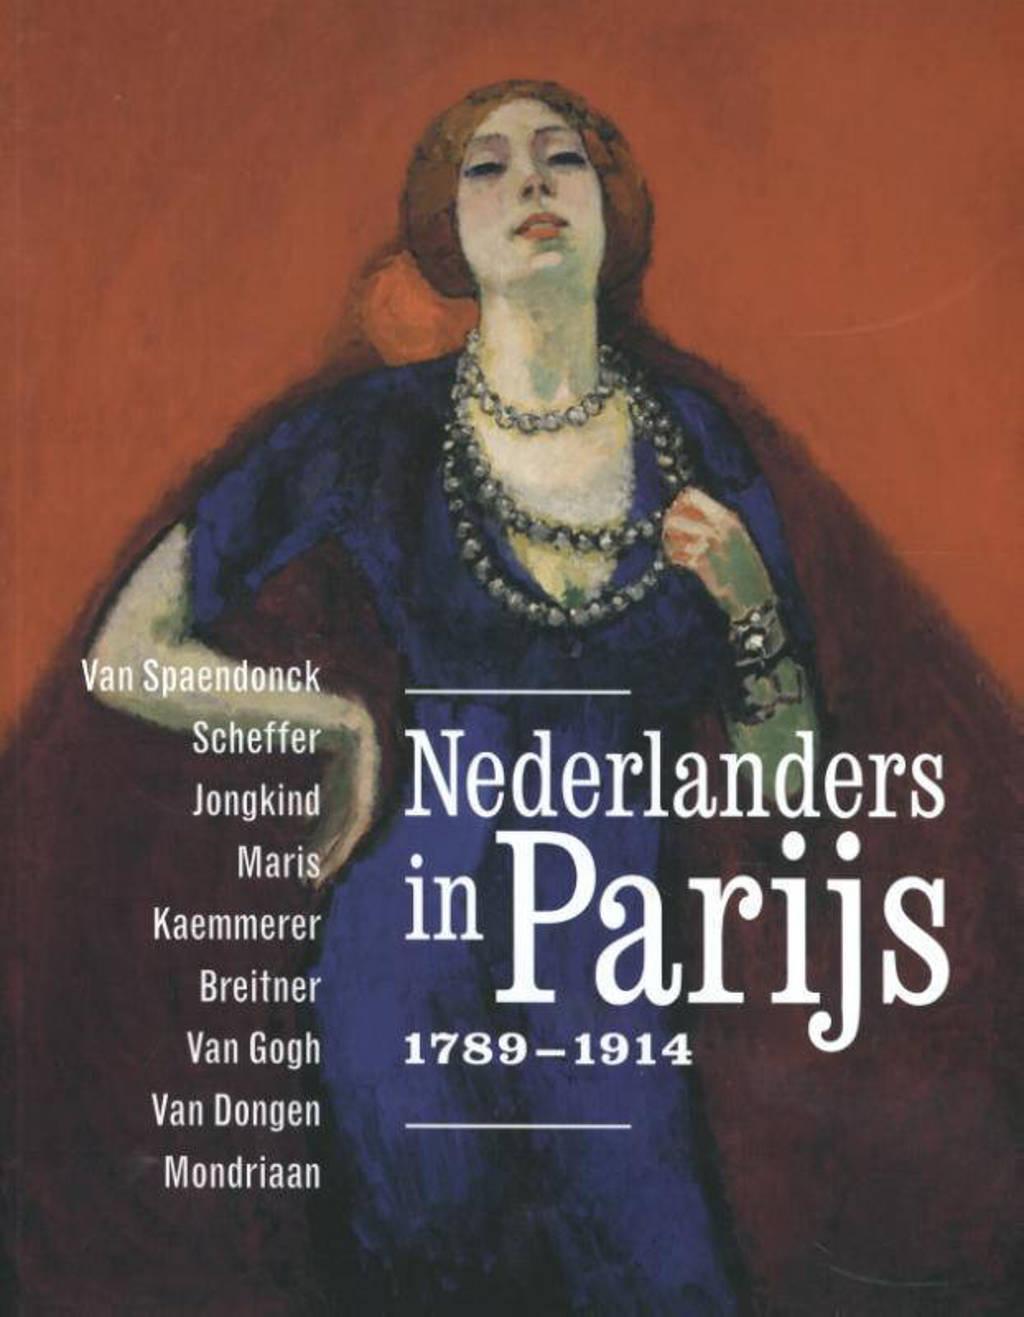 Nederlanders in Parijs 1789-1914. - Stéphanie Cantarutti, Maite van Dijk, Malika M'rani Alaoui, e.a.